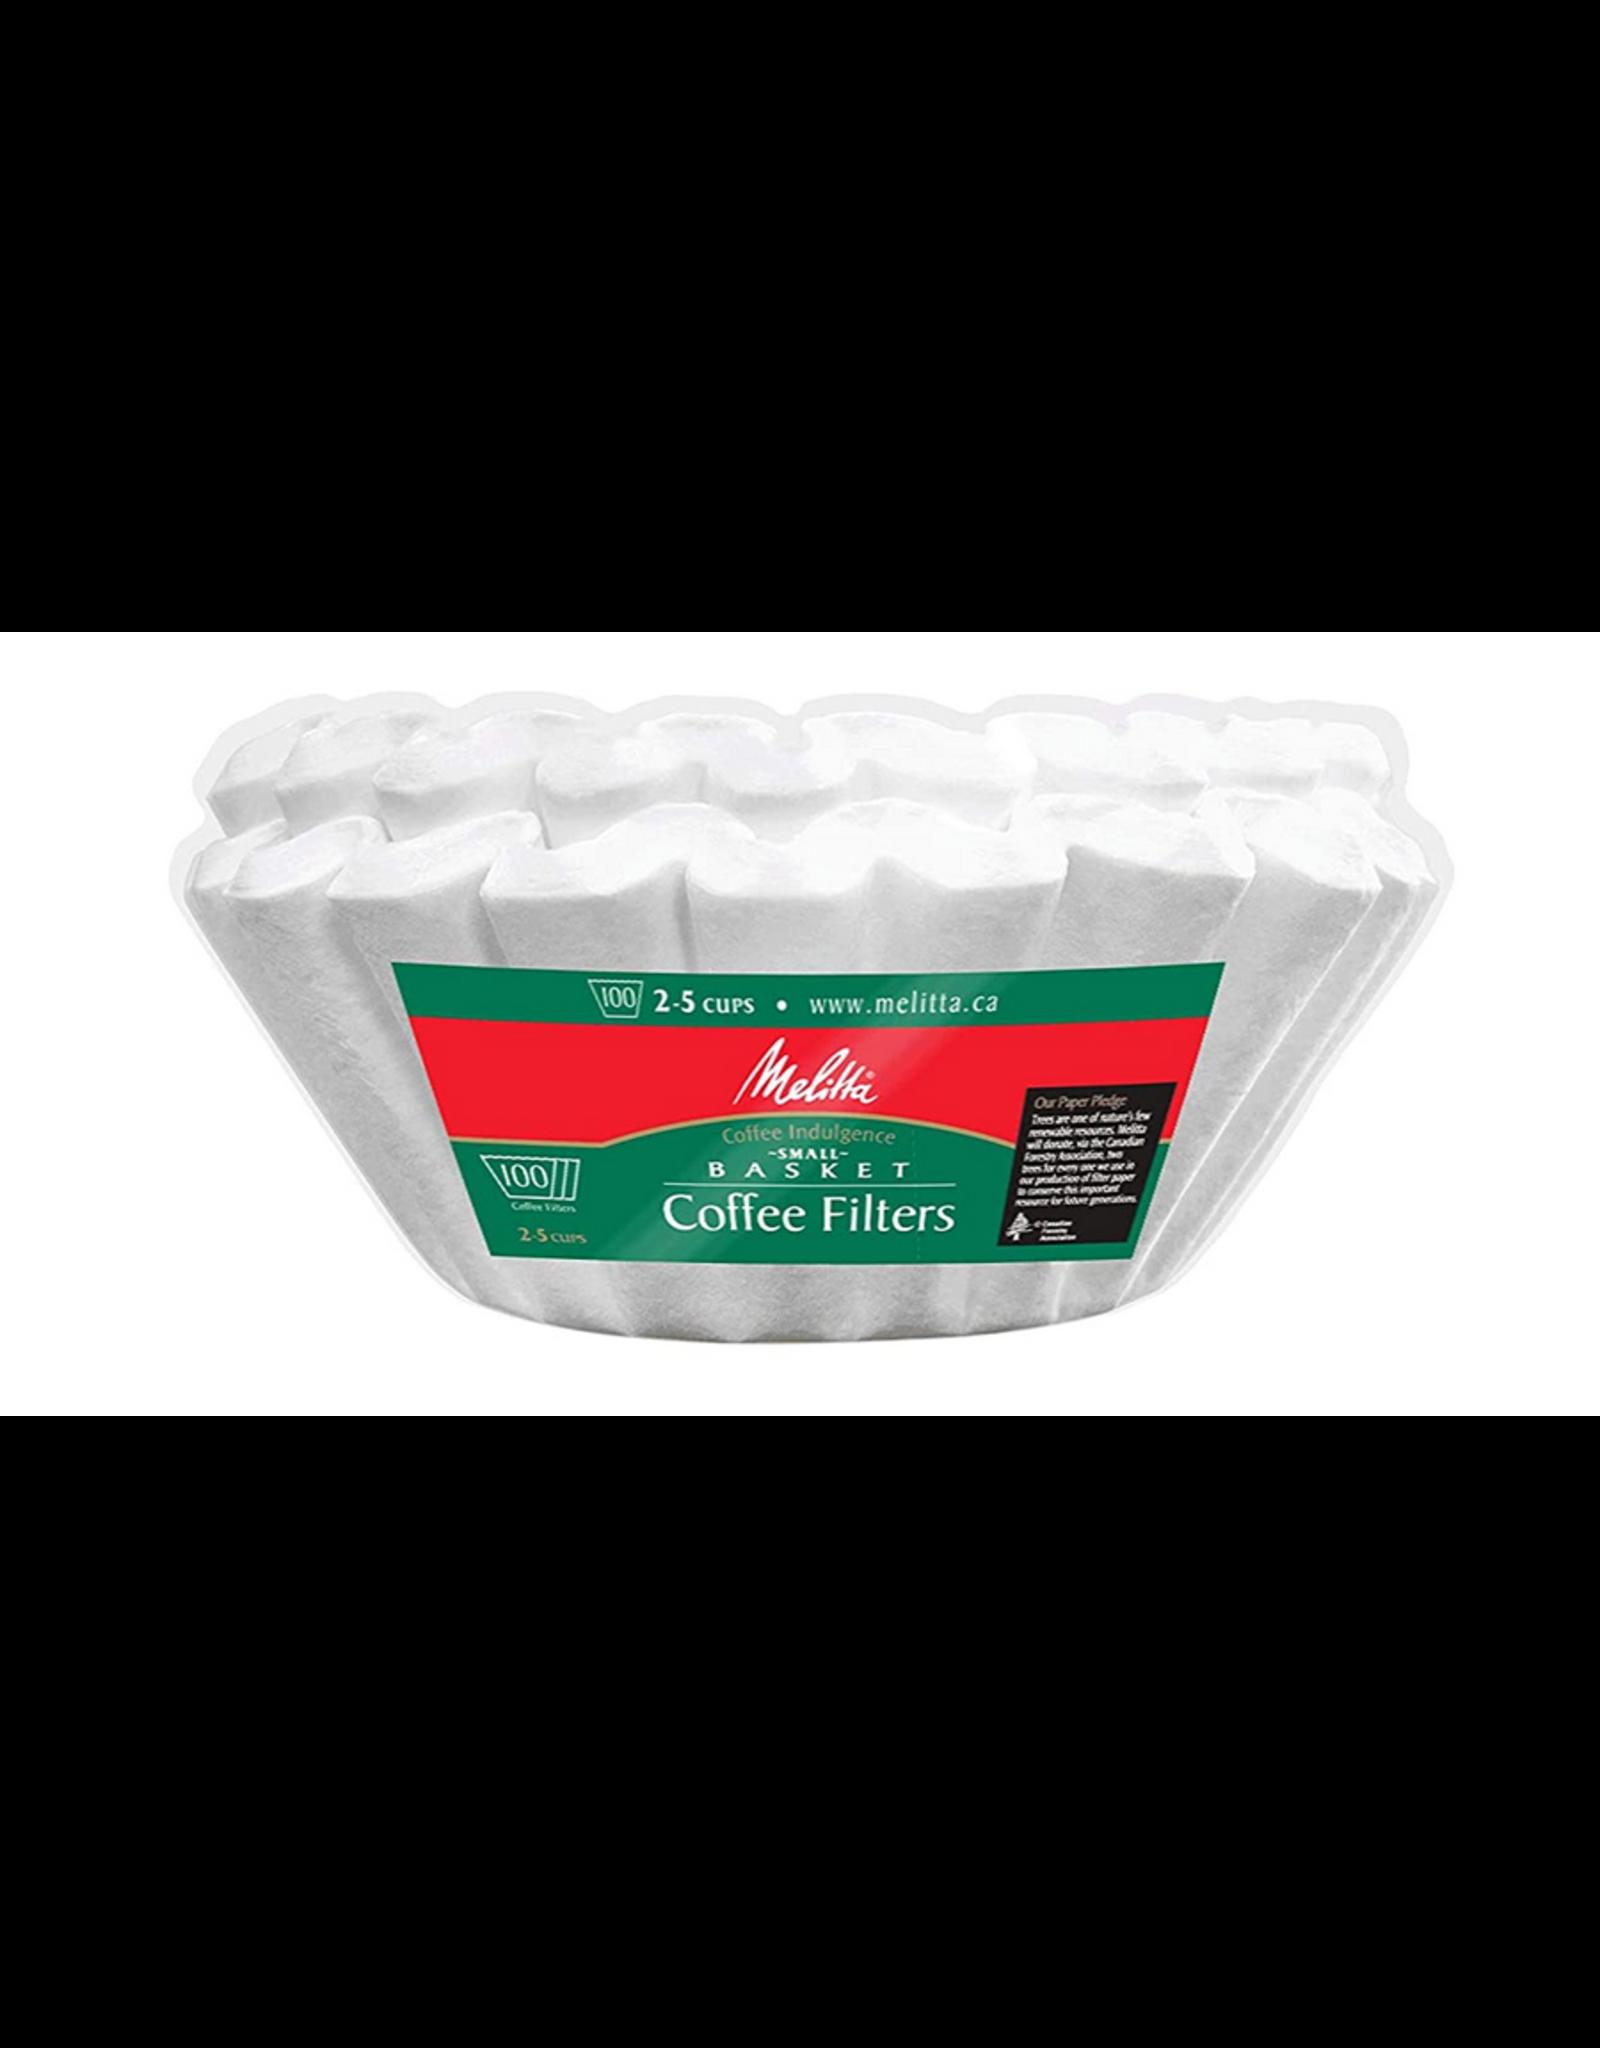 Melitta Melitta Small Basket Coffee Filters 100/pack